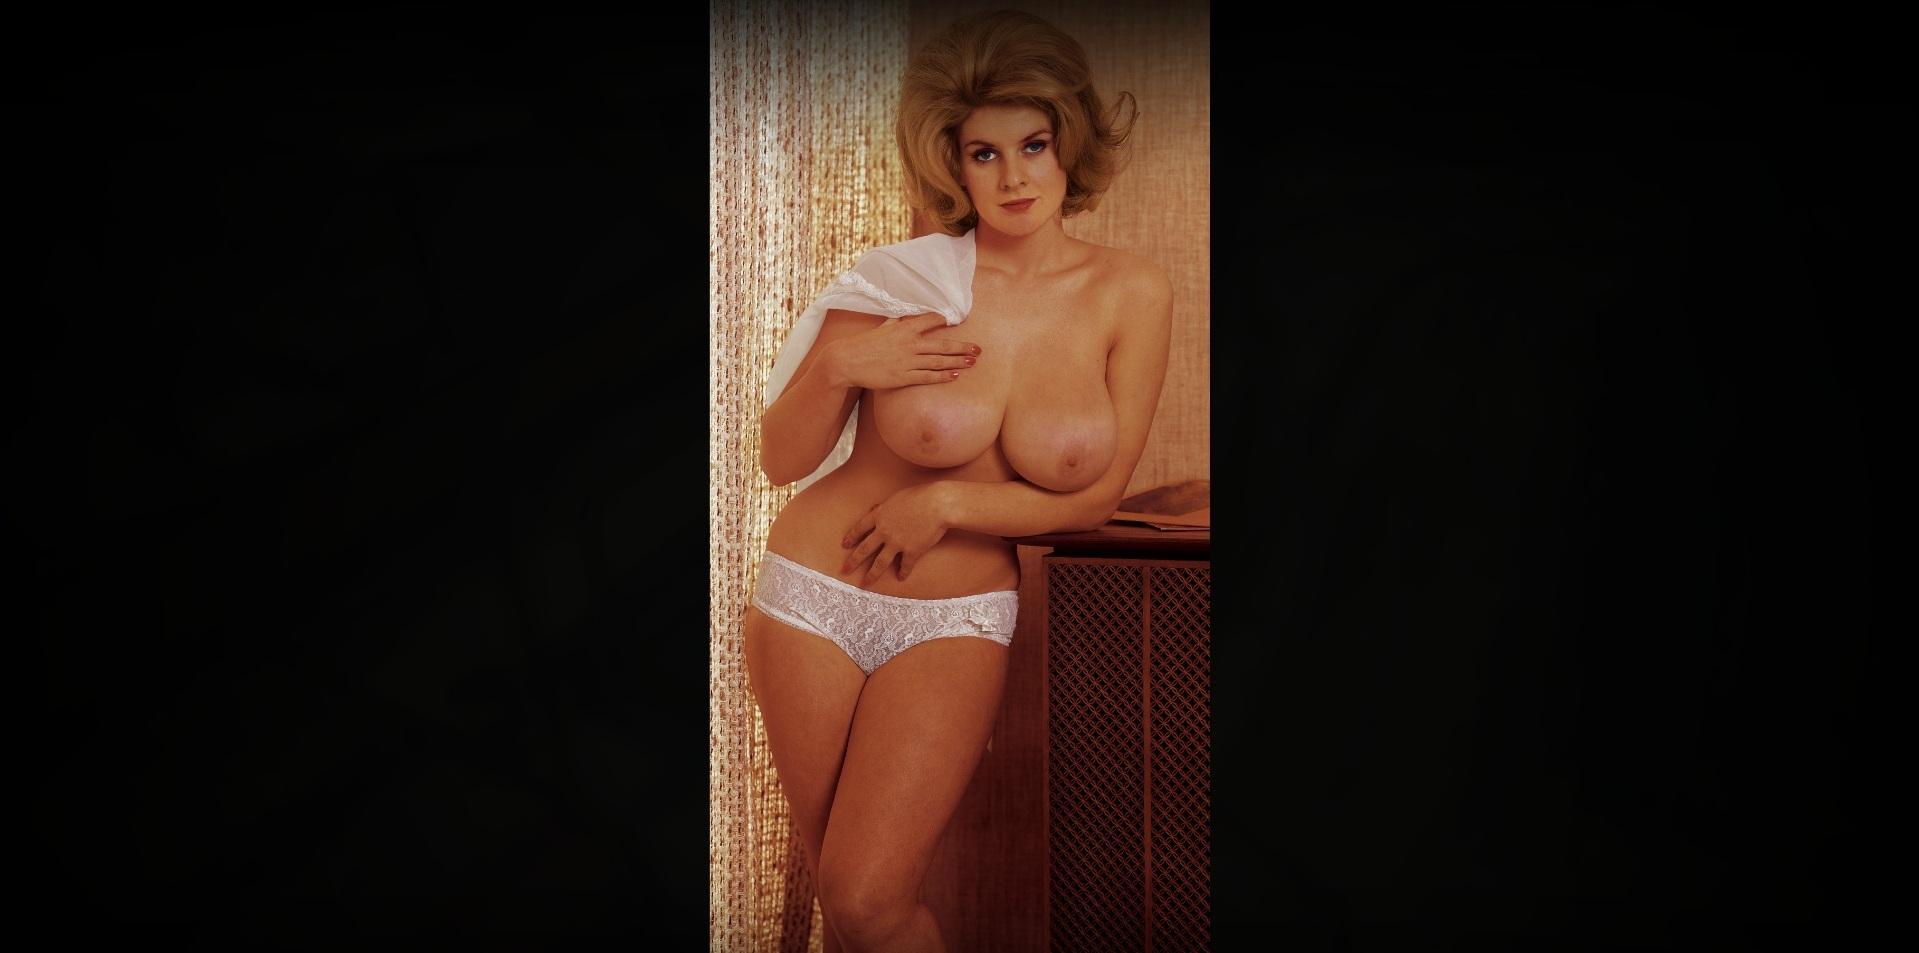 Vintage Ázijské porno fotky